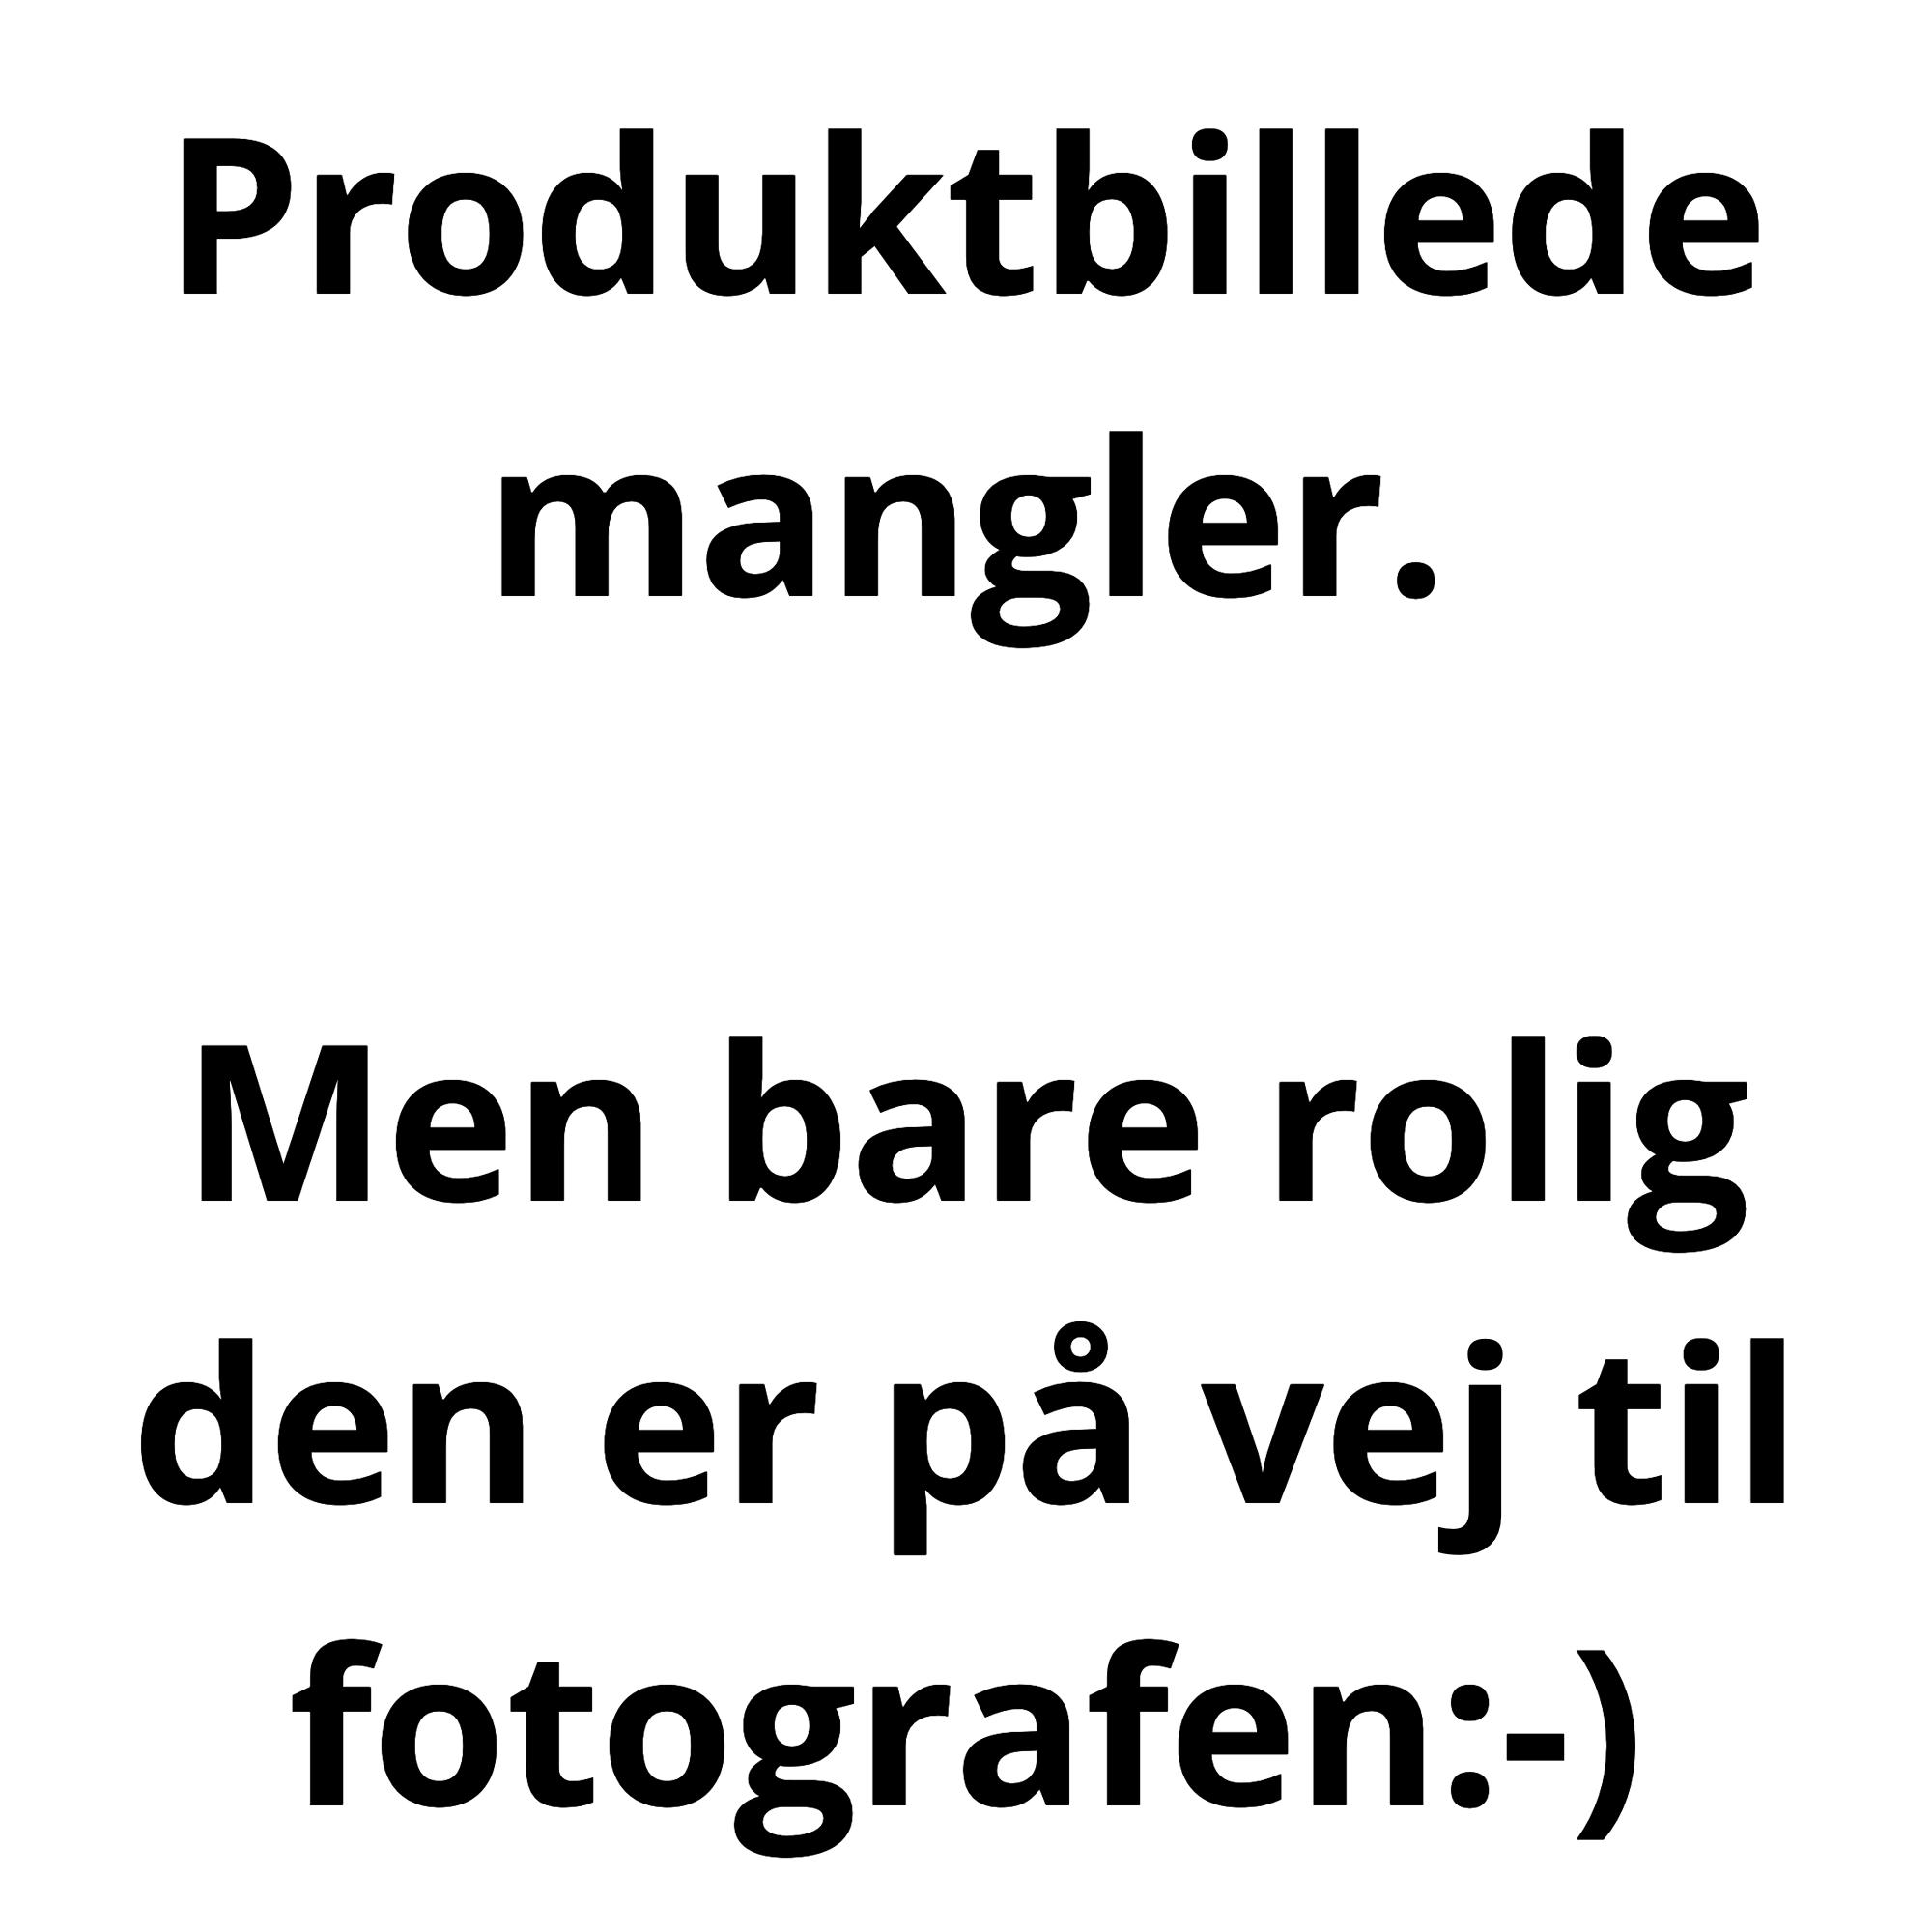 Brodit Apple iPhone 5/5S Justerbar holder B:59-63/6:9-10 - Aktiv holder